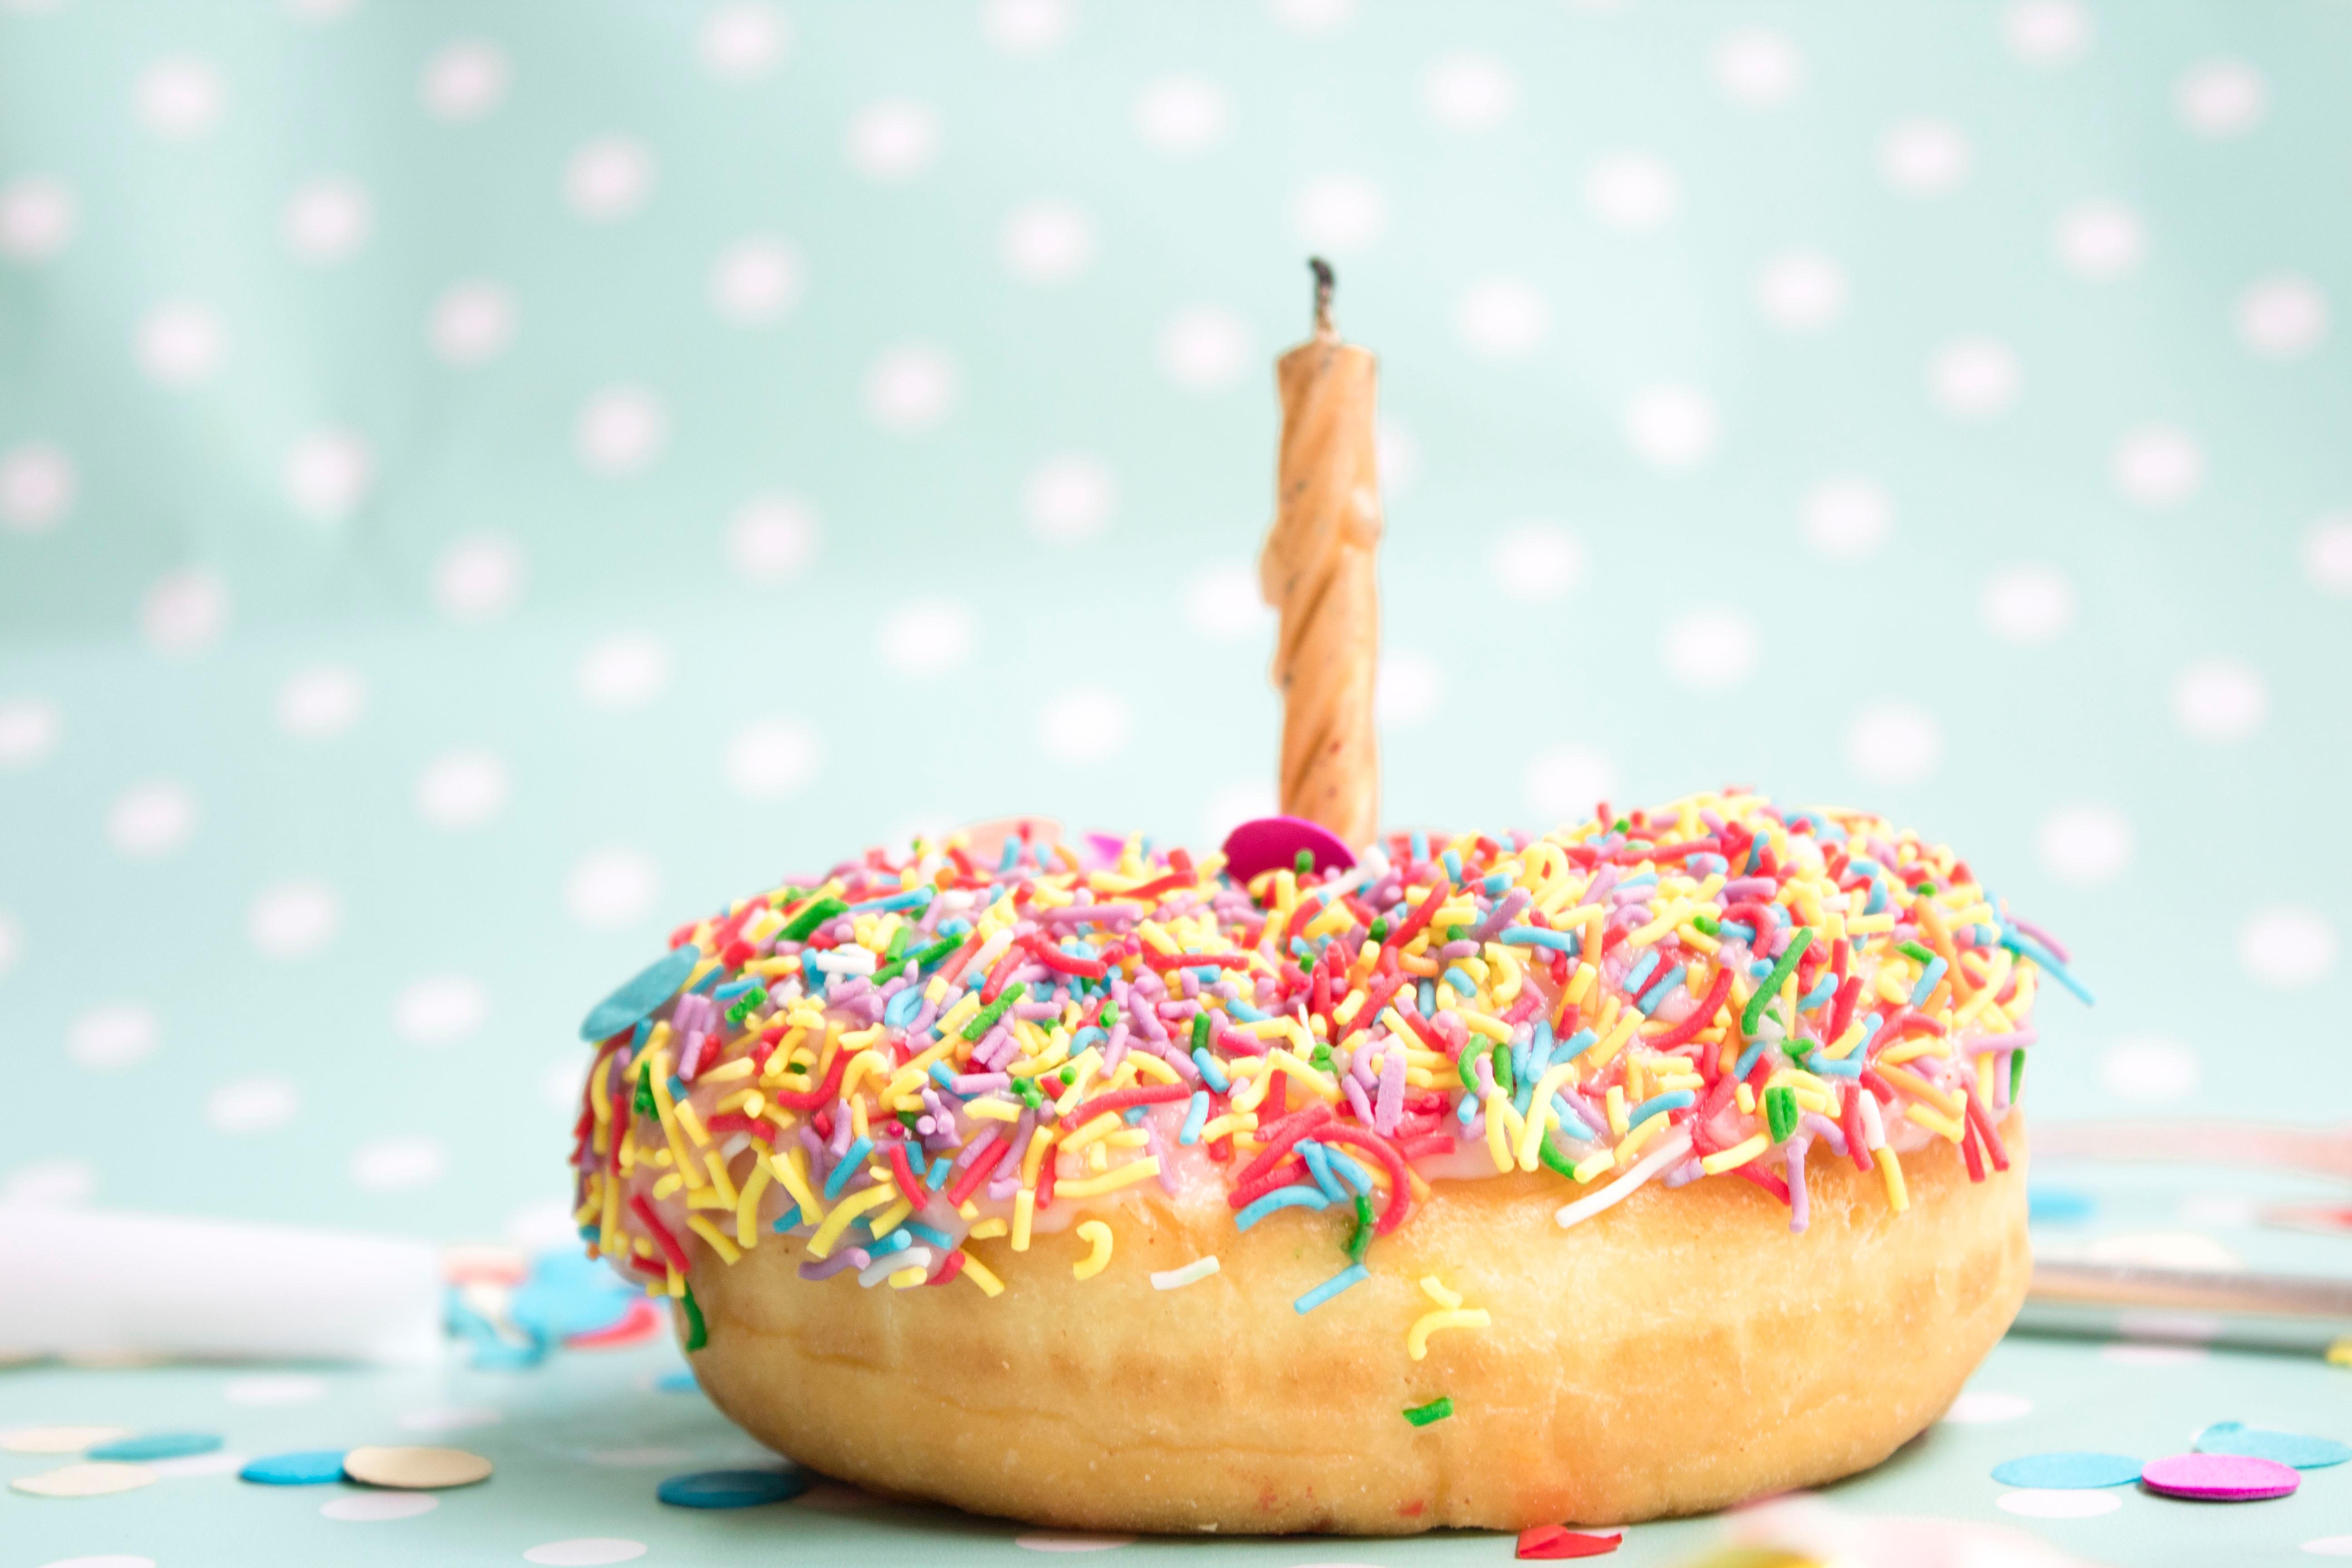 Baudville Celebrates National Doughnut Day